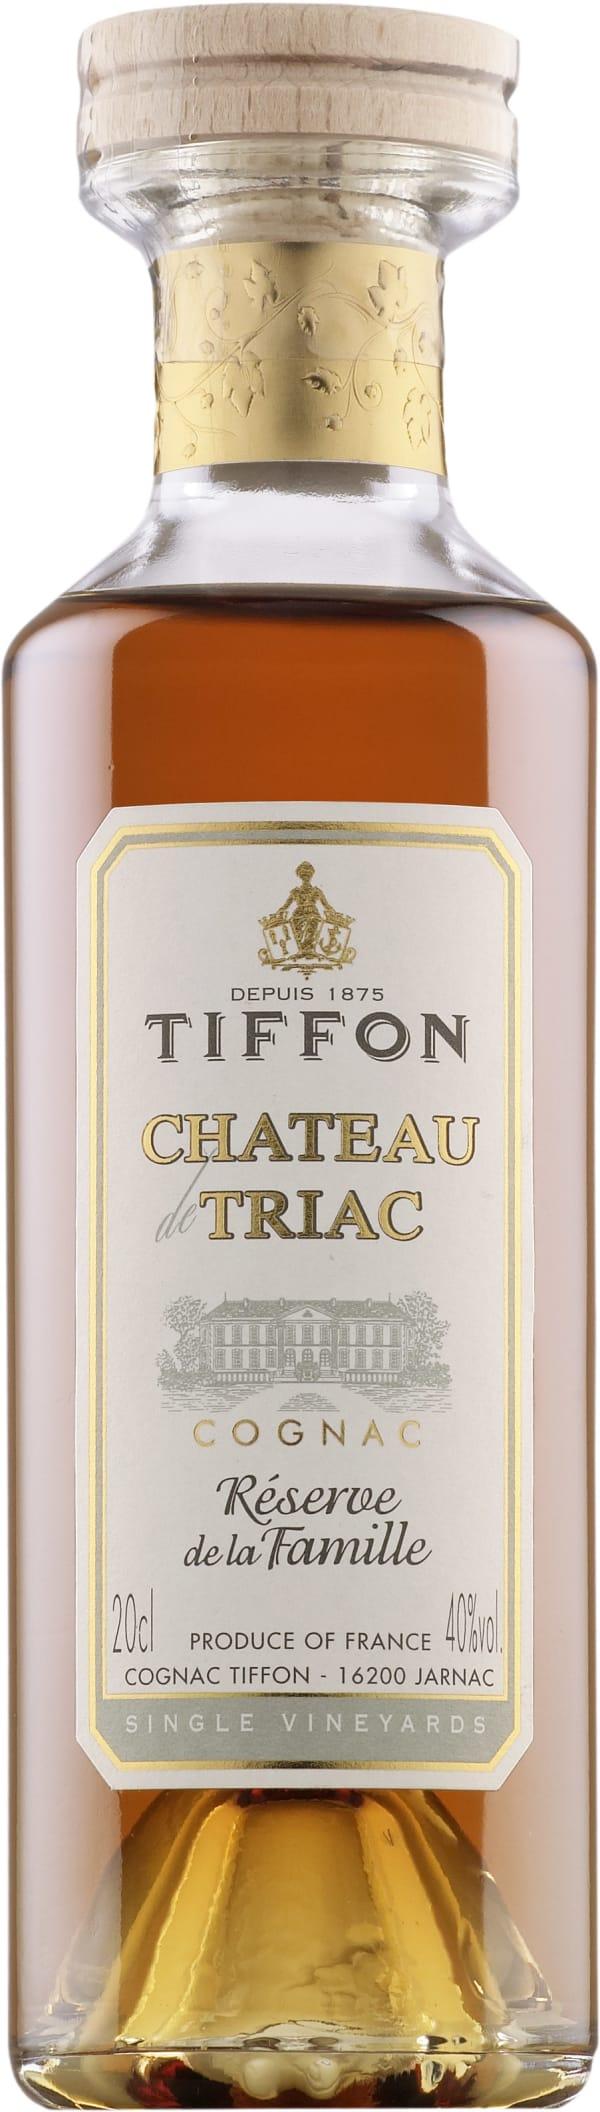 Tiffon Chateau de Triac Reserve de la Famille